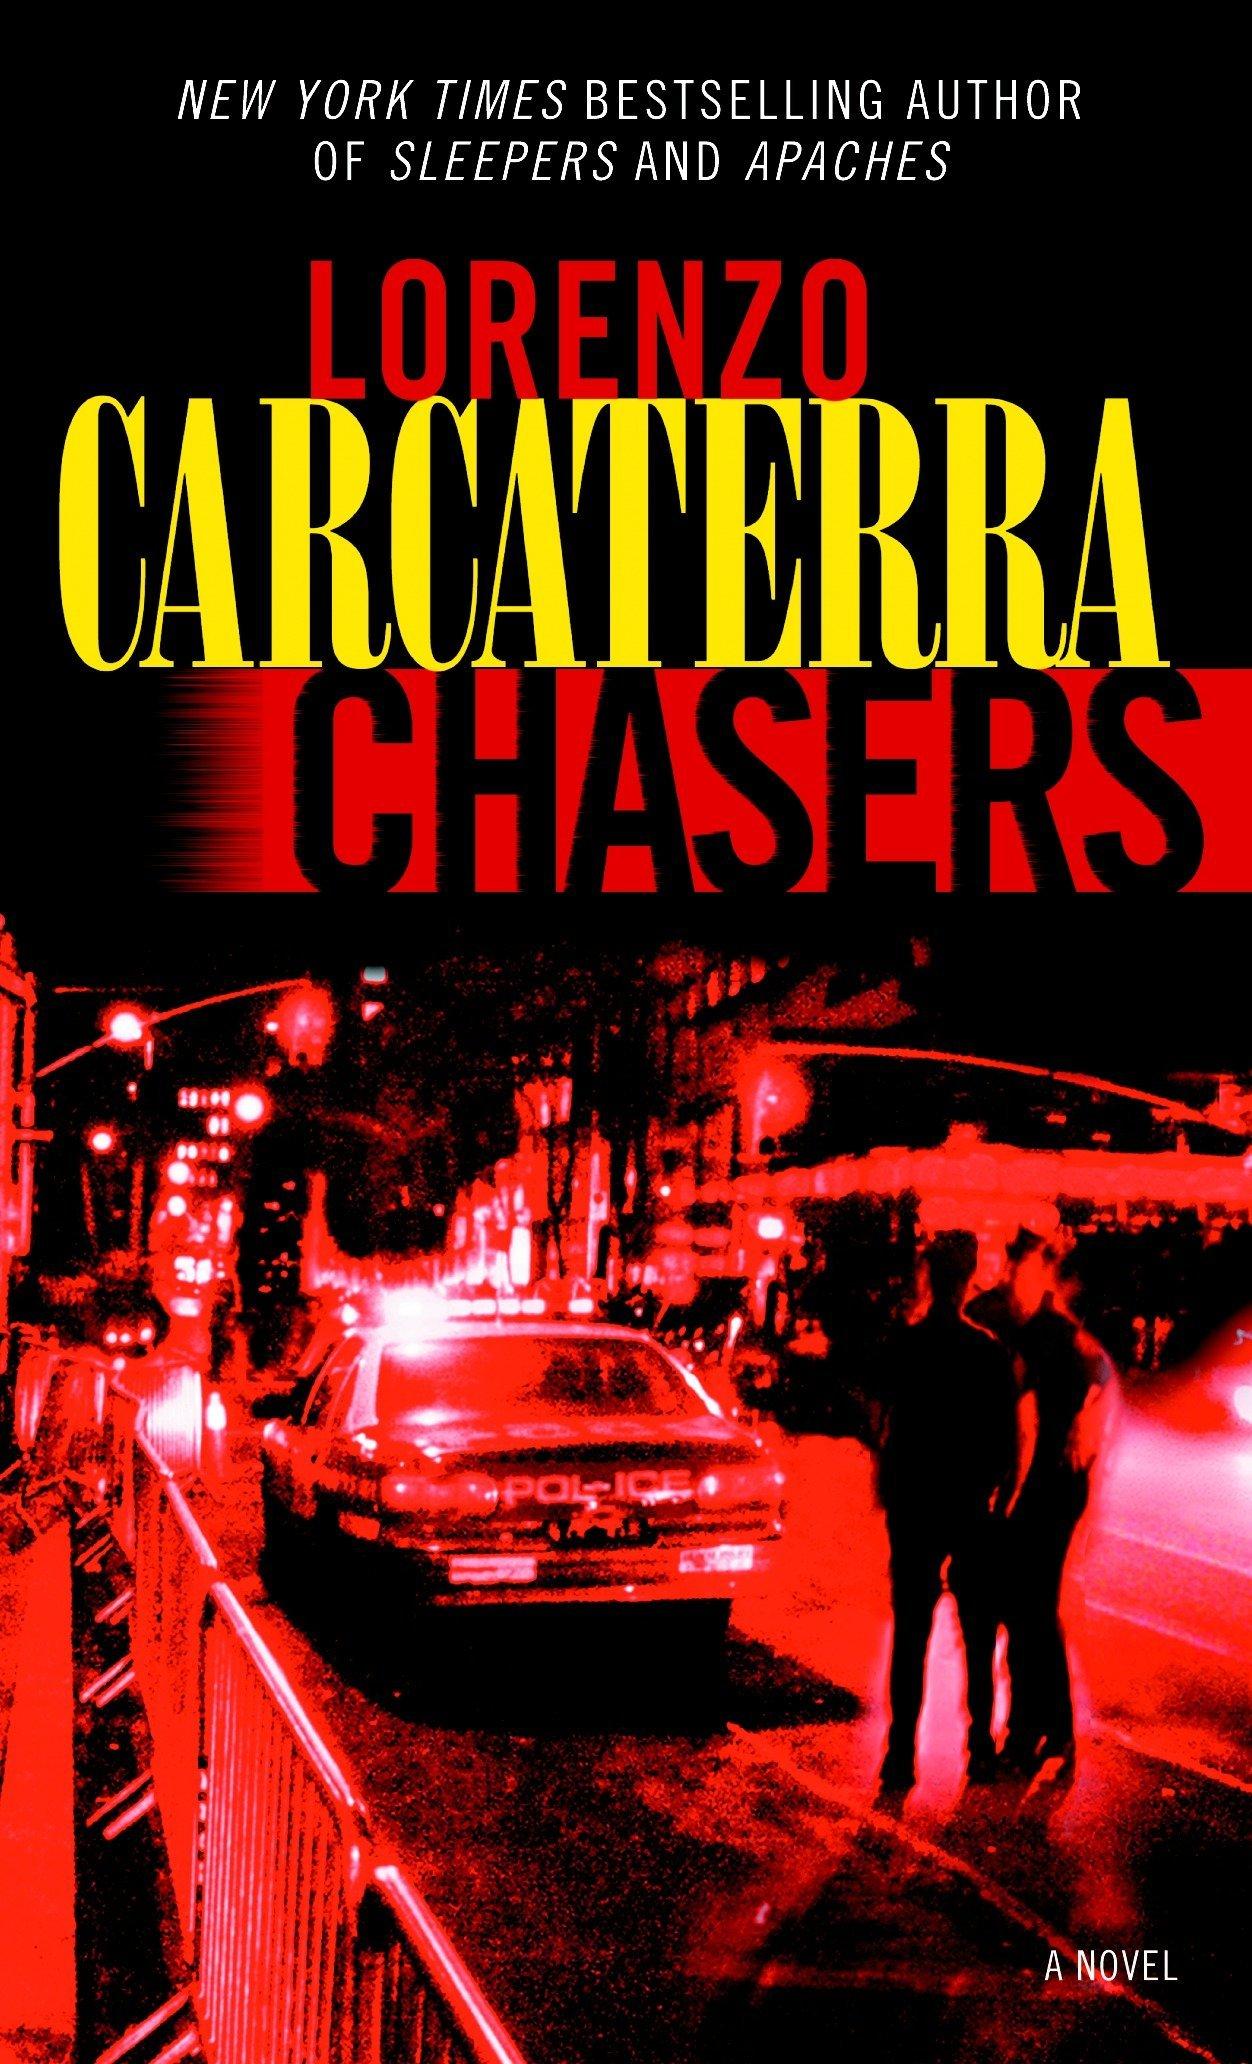 Chasers A Novel Amazon De Carcaterra Lorenzo Fremdsprachige Bucher